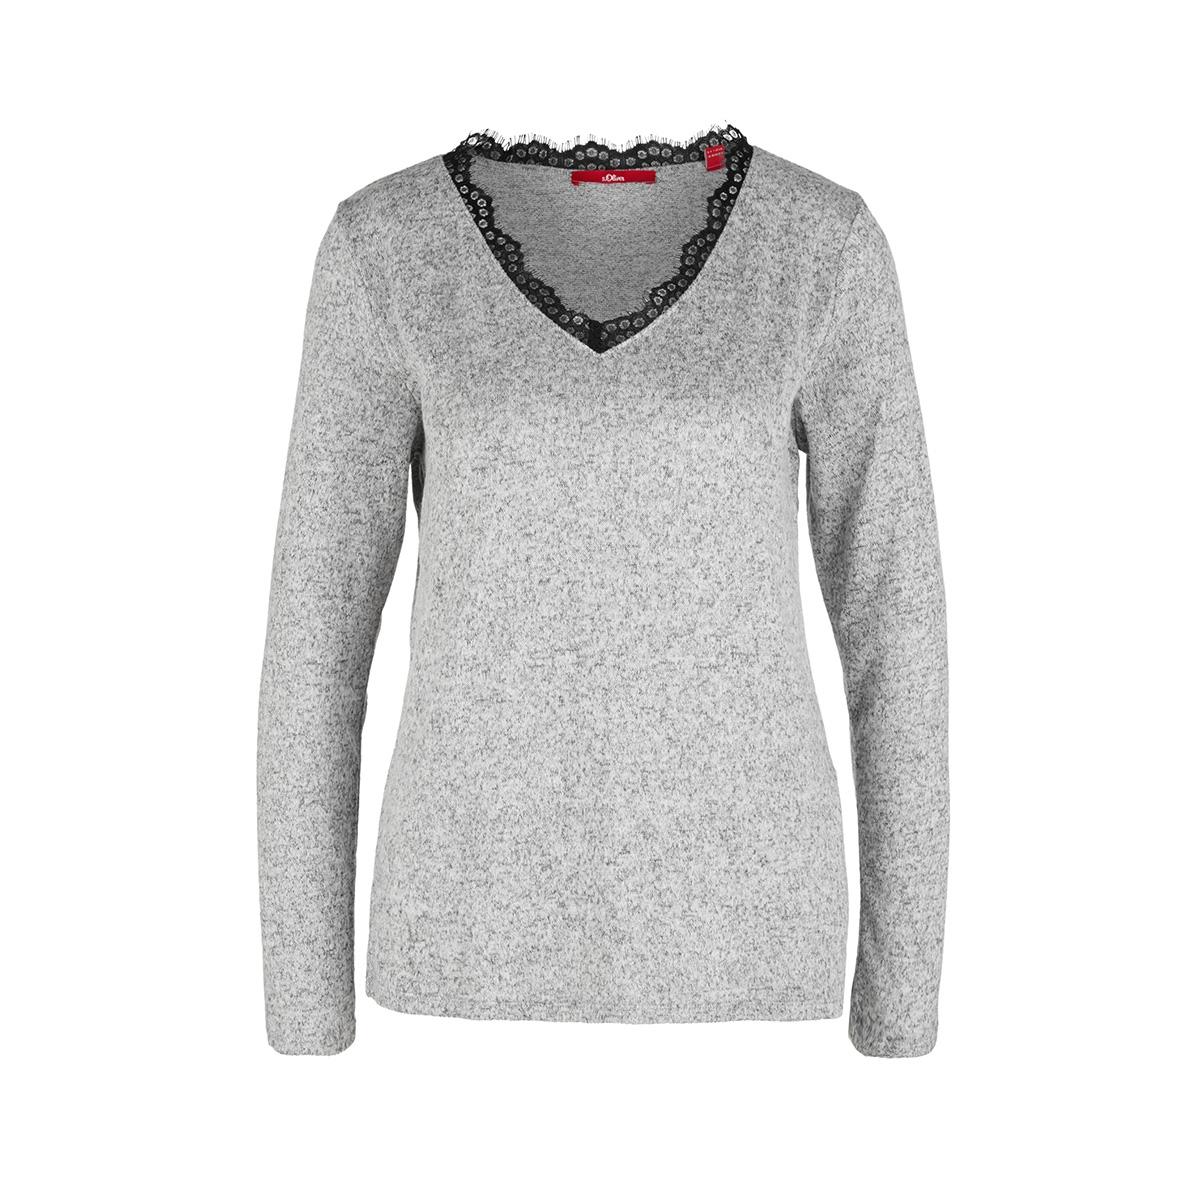 longsleeve 05912316893 s.oliver t-shirt 9400